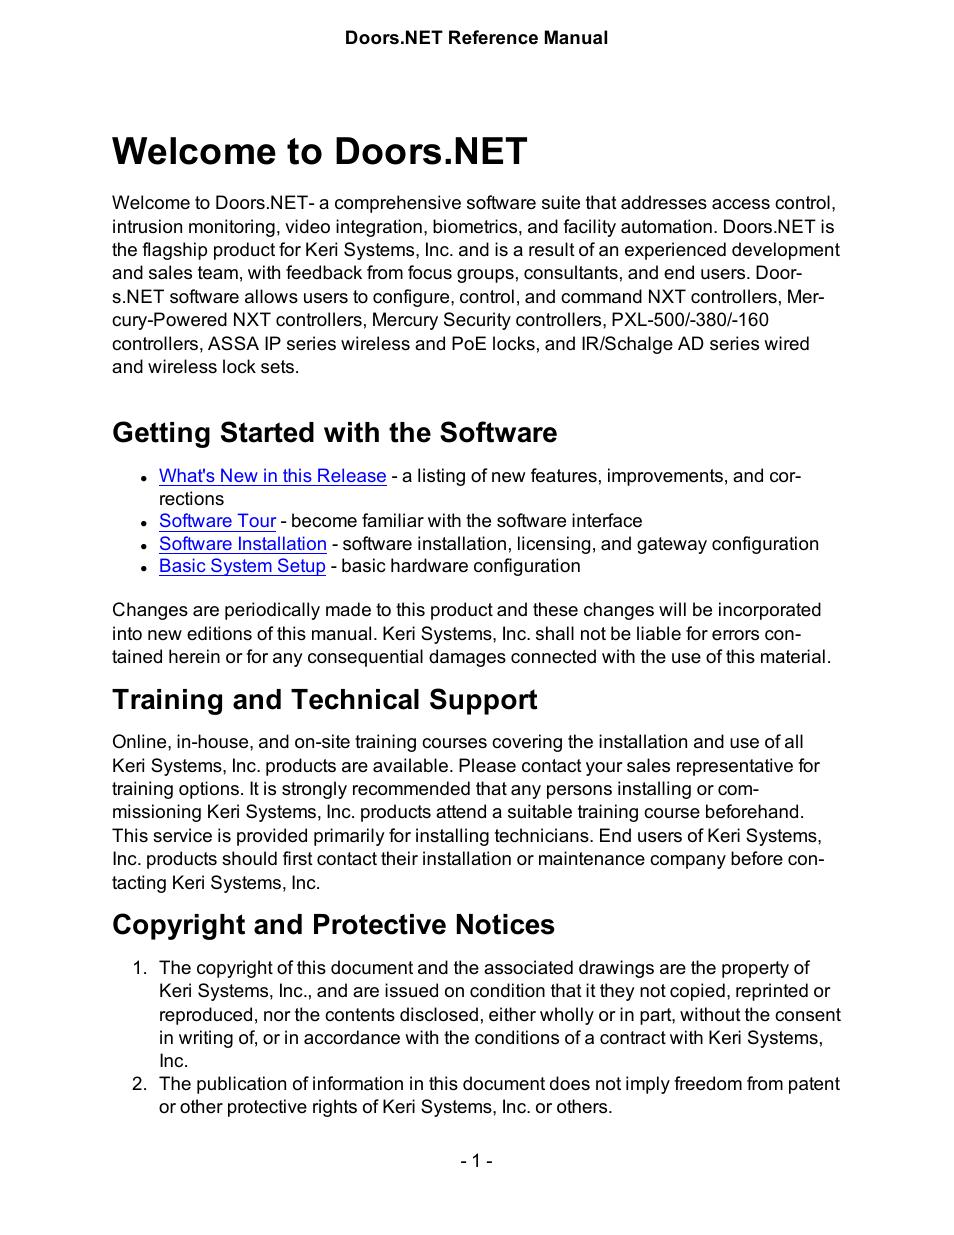 [QMVU_8575]  Keri Systems Doors.NET Manual User Manual | 602 pages | Keri Access Wiring Diagram |  | Manuals Directory